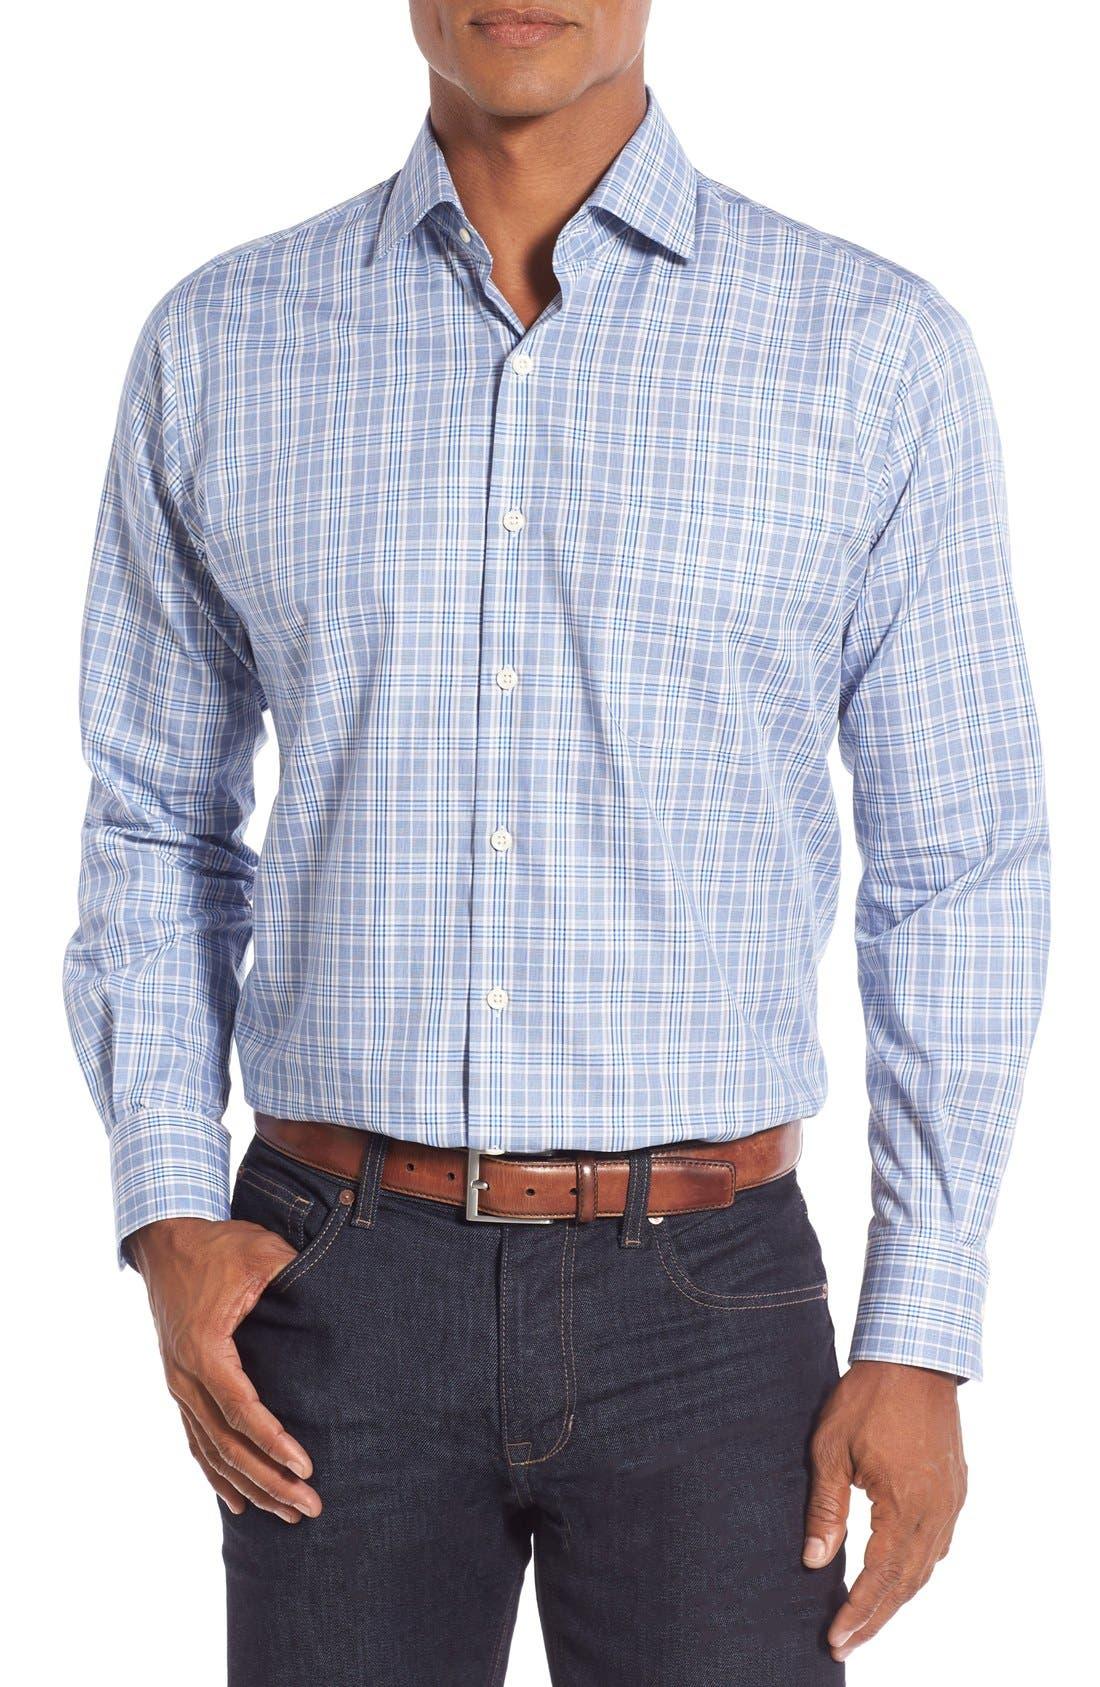 Main Image - Peter Millar Regular Fit Glen Plaid Sport Shirt